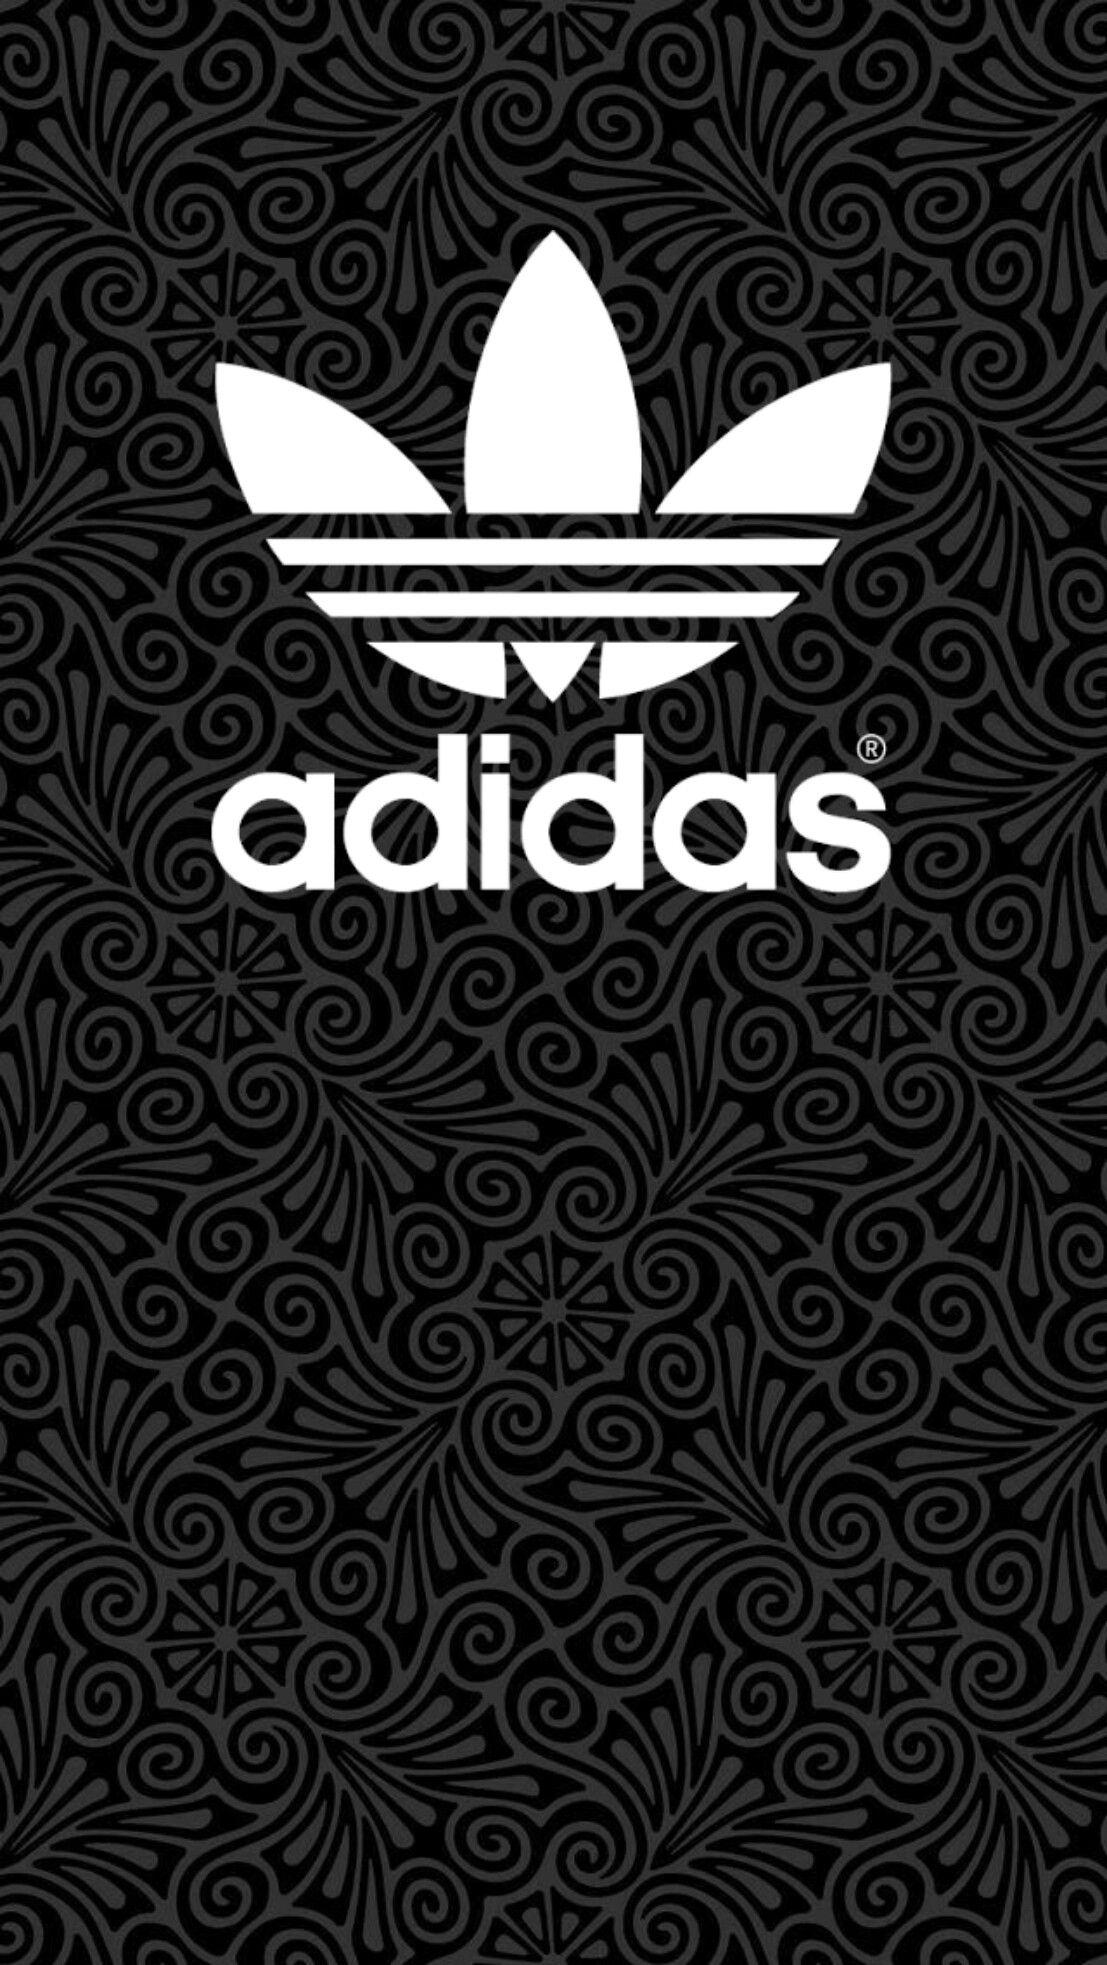 Adidas Logo White Wallpaper Background Screensaver Adidas Black